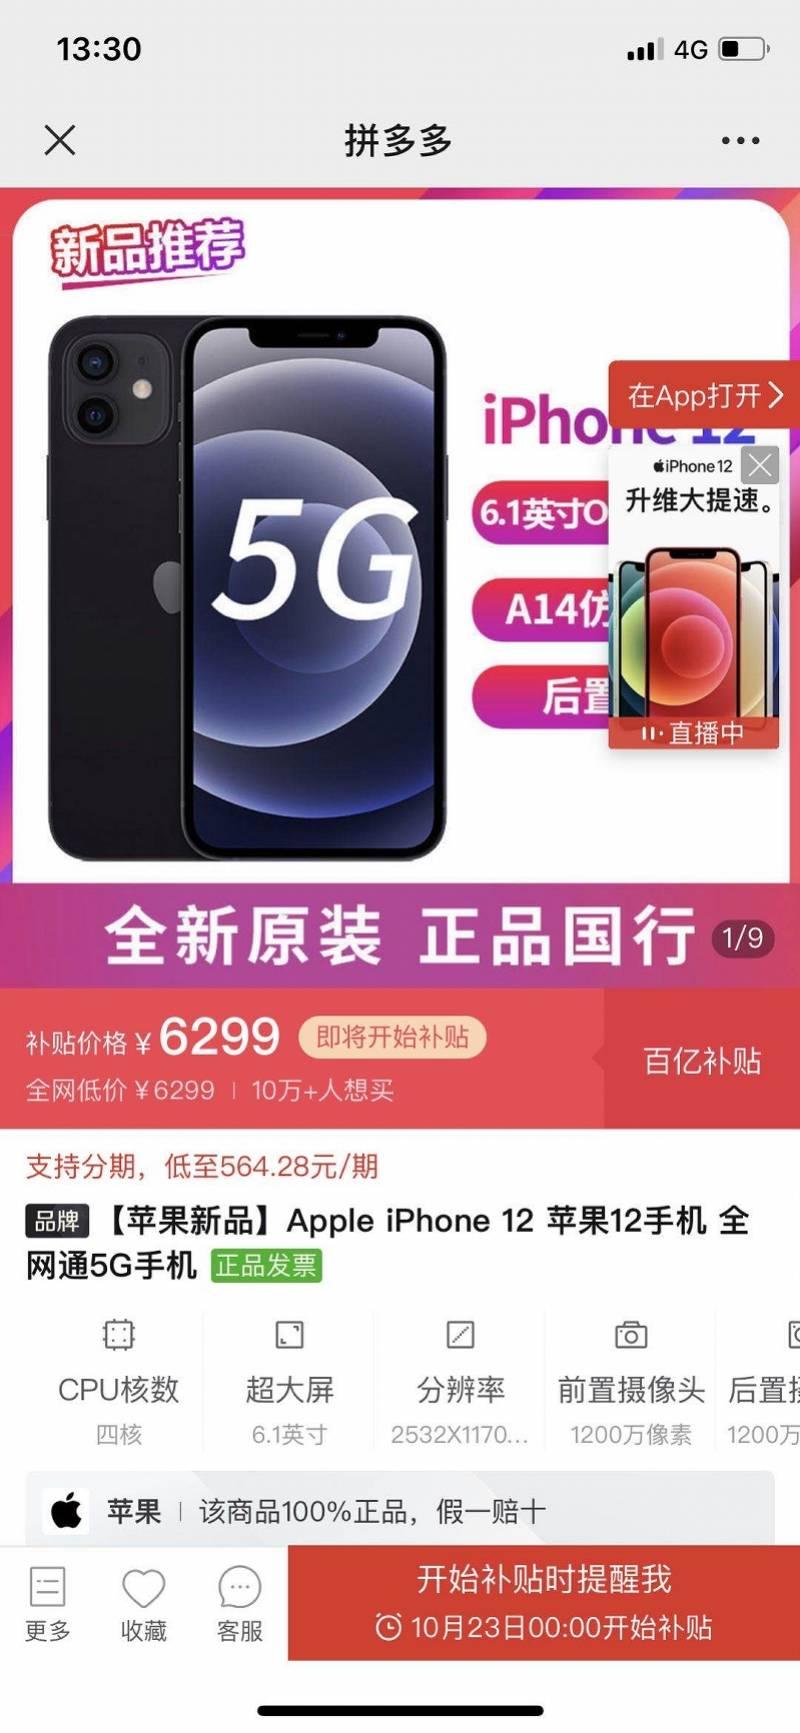 iPhone12预售火爆苹果官网被挤崩,iPhone12系列受欢迎程度已经超过苹果iPhone11